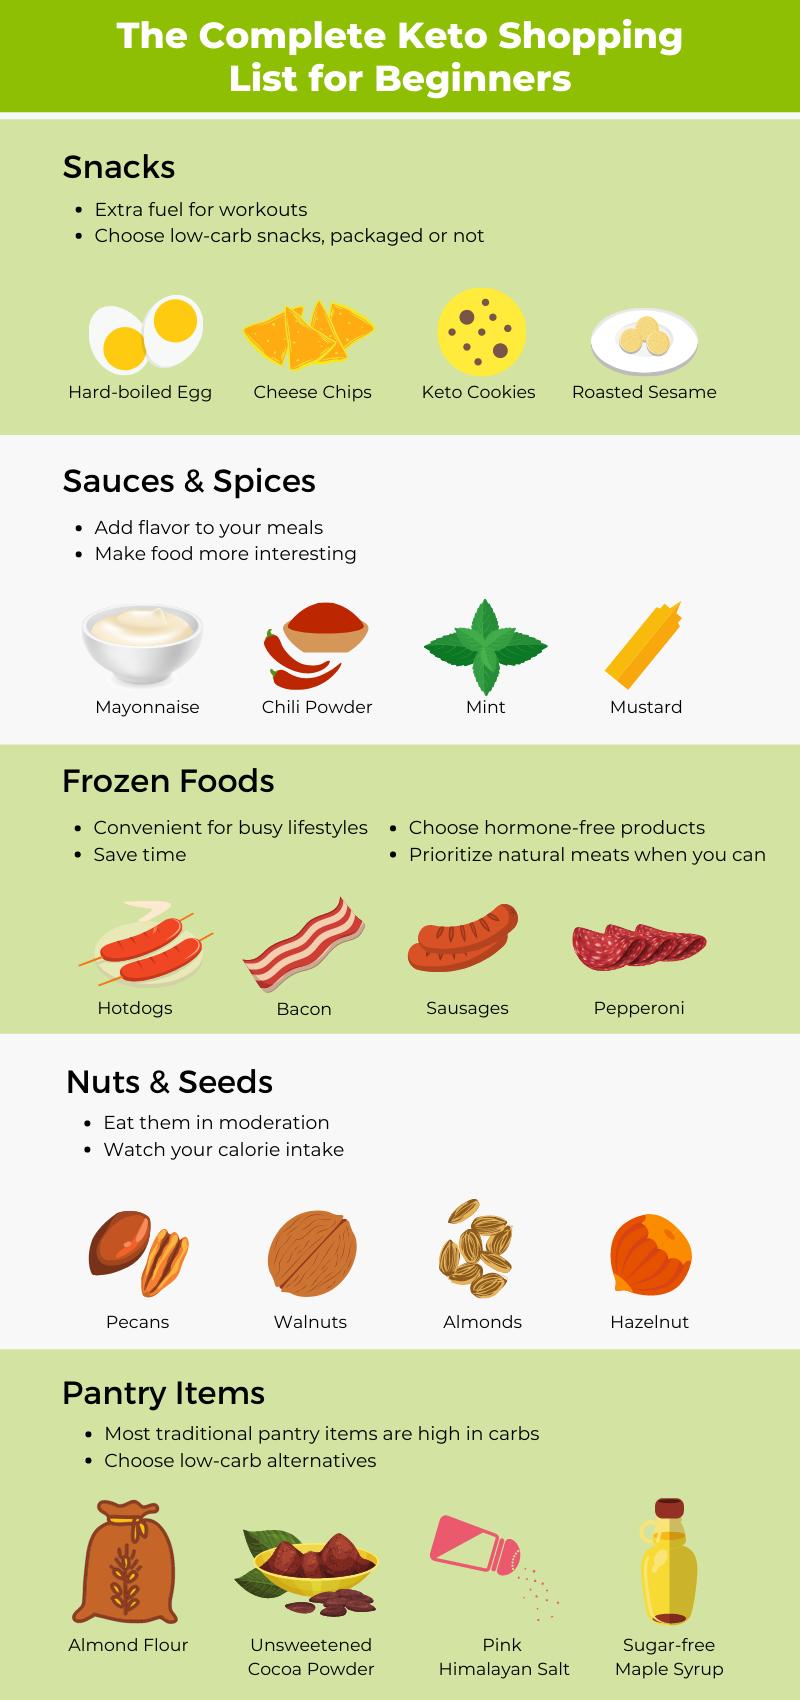 keto shopping list infographic 2